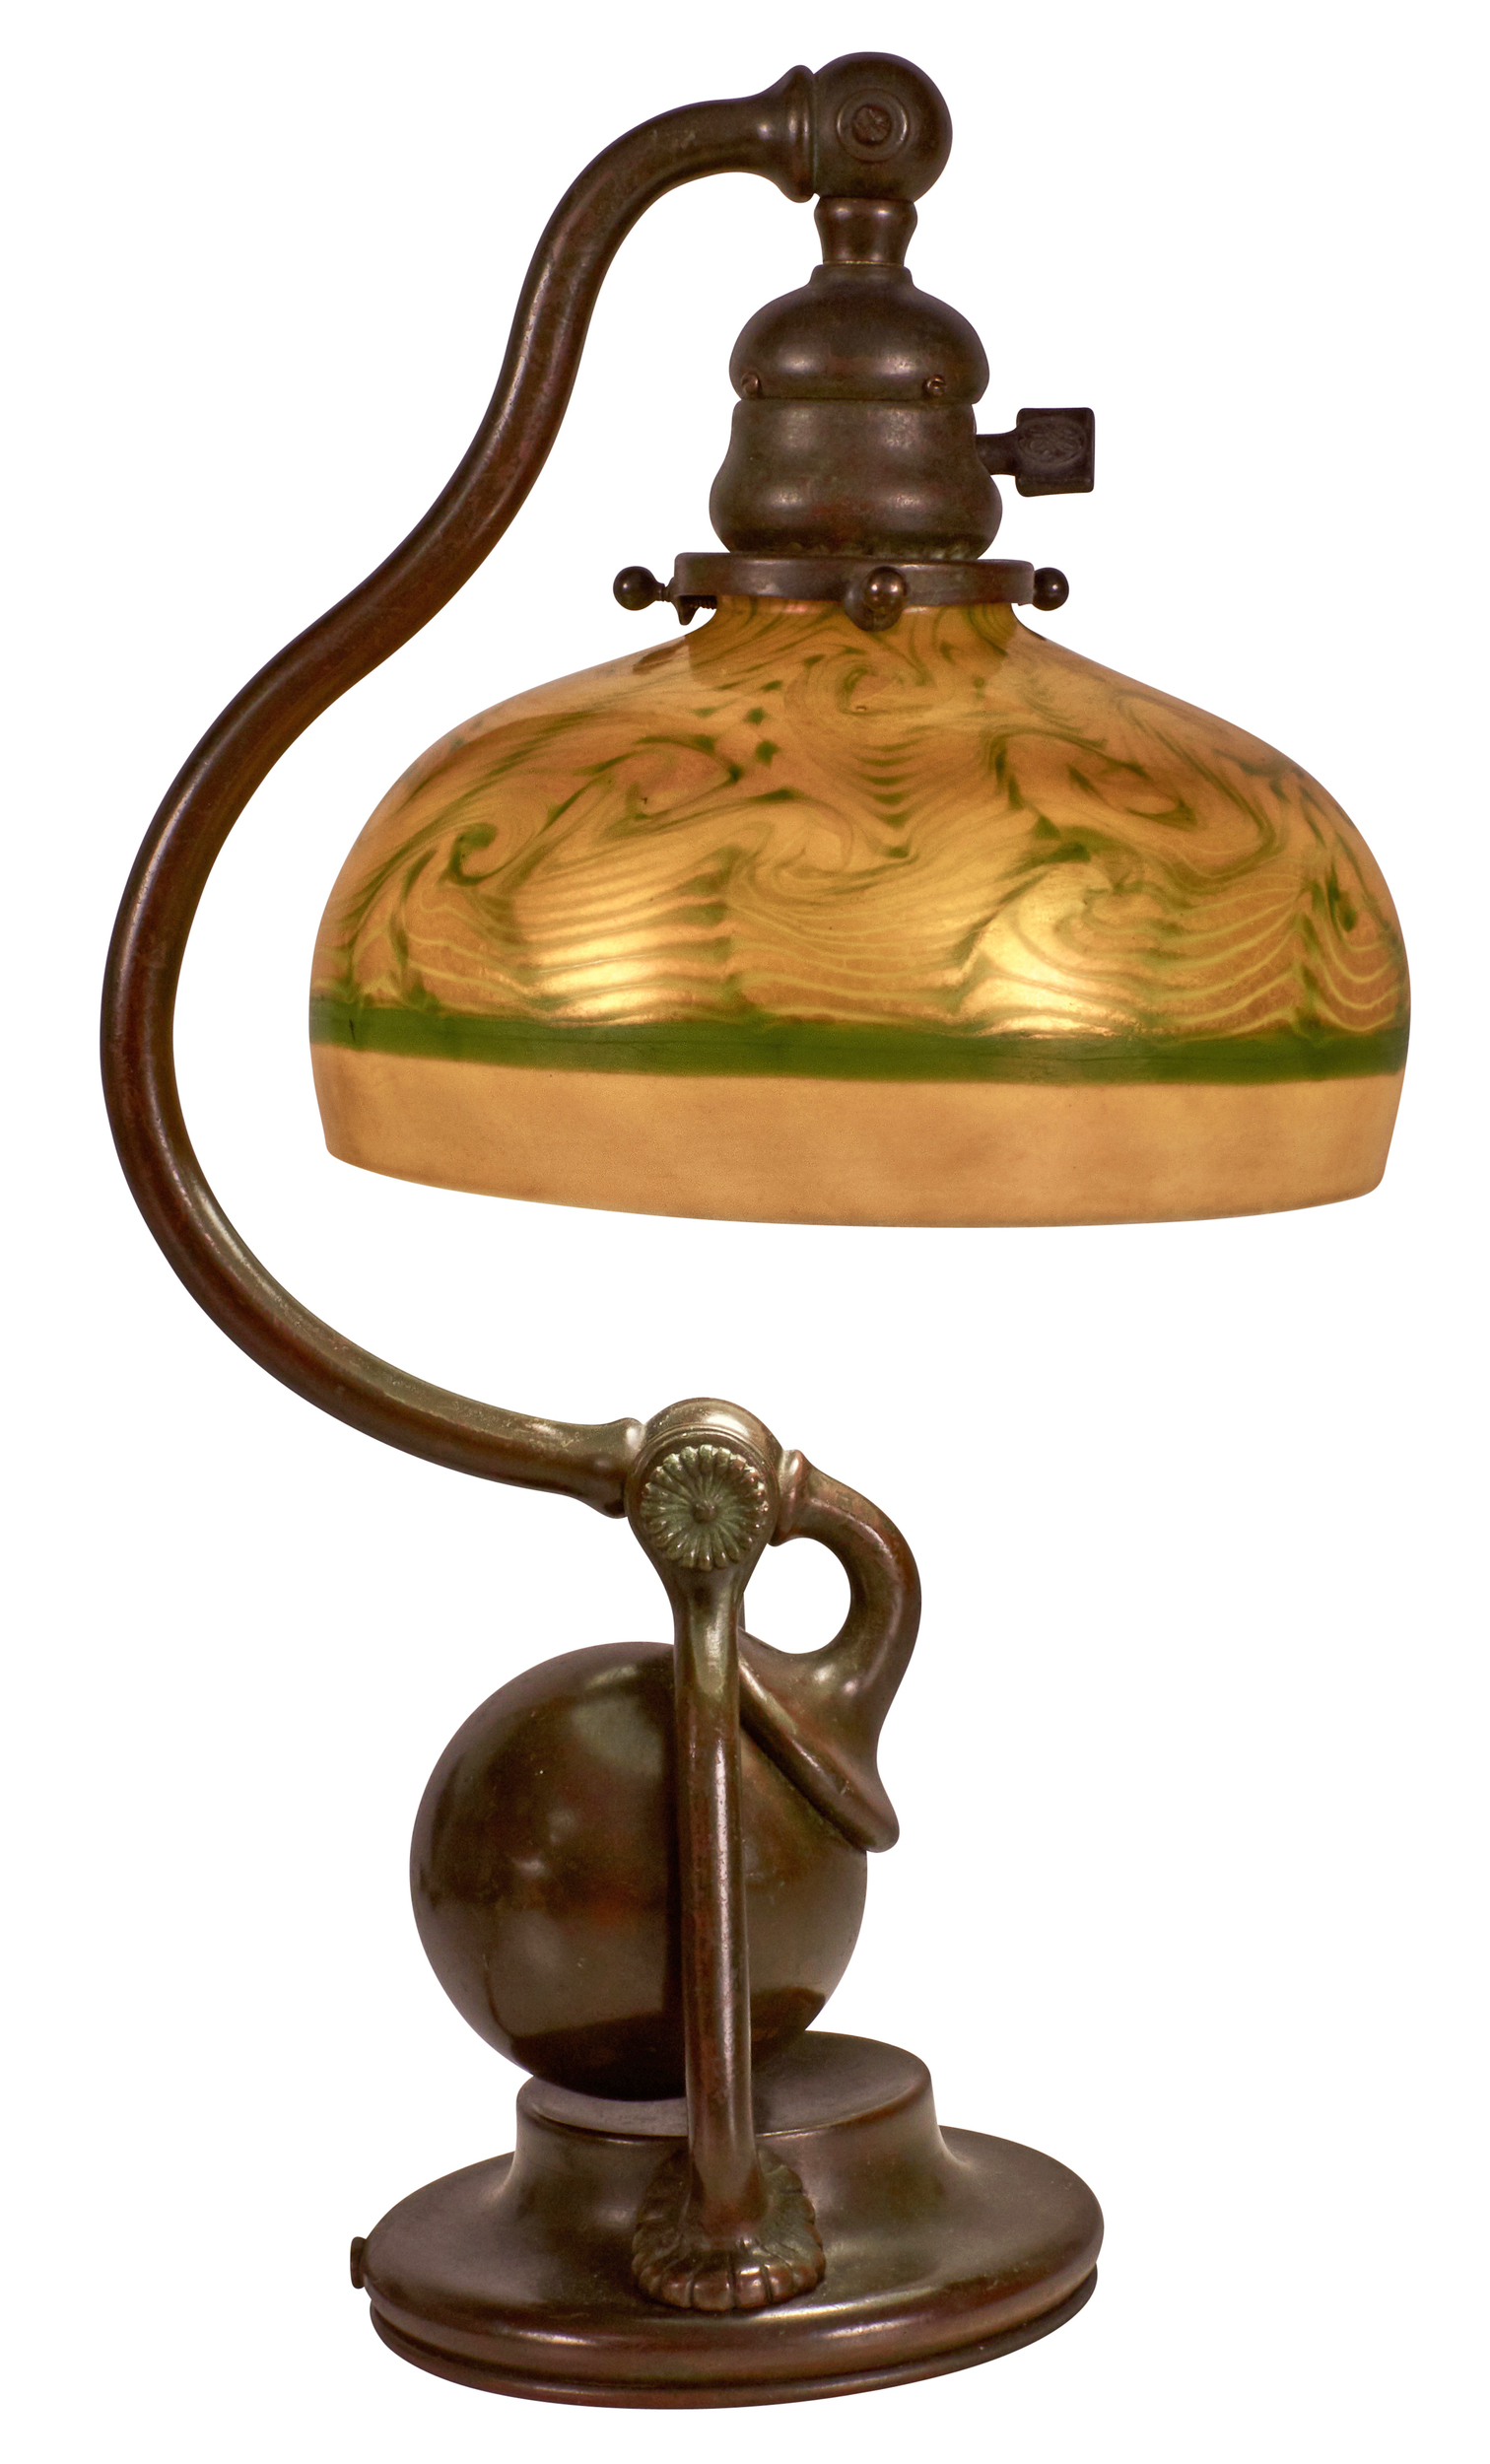 Tiffany Studios Counterbalance Lamp Treadway Gallery